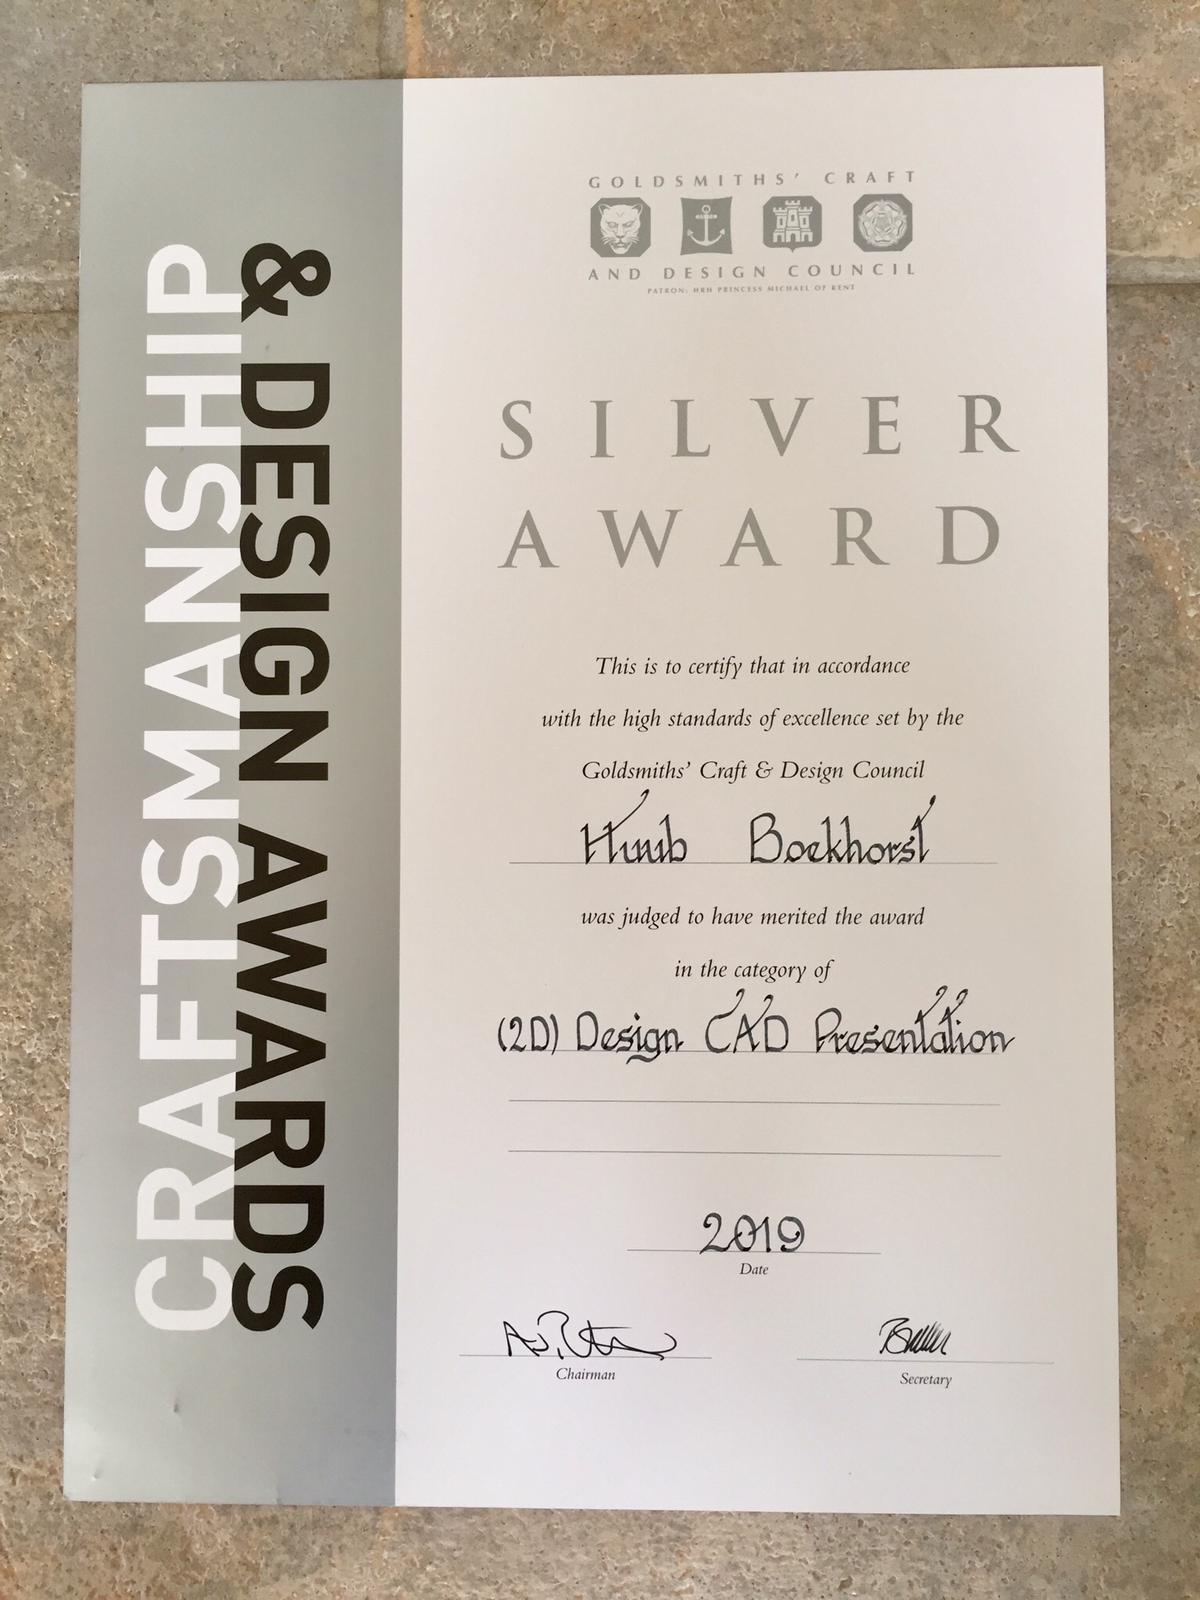 Goldsmith's Craft & Design Council awards 2019